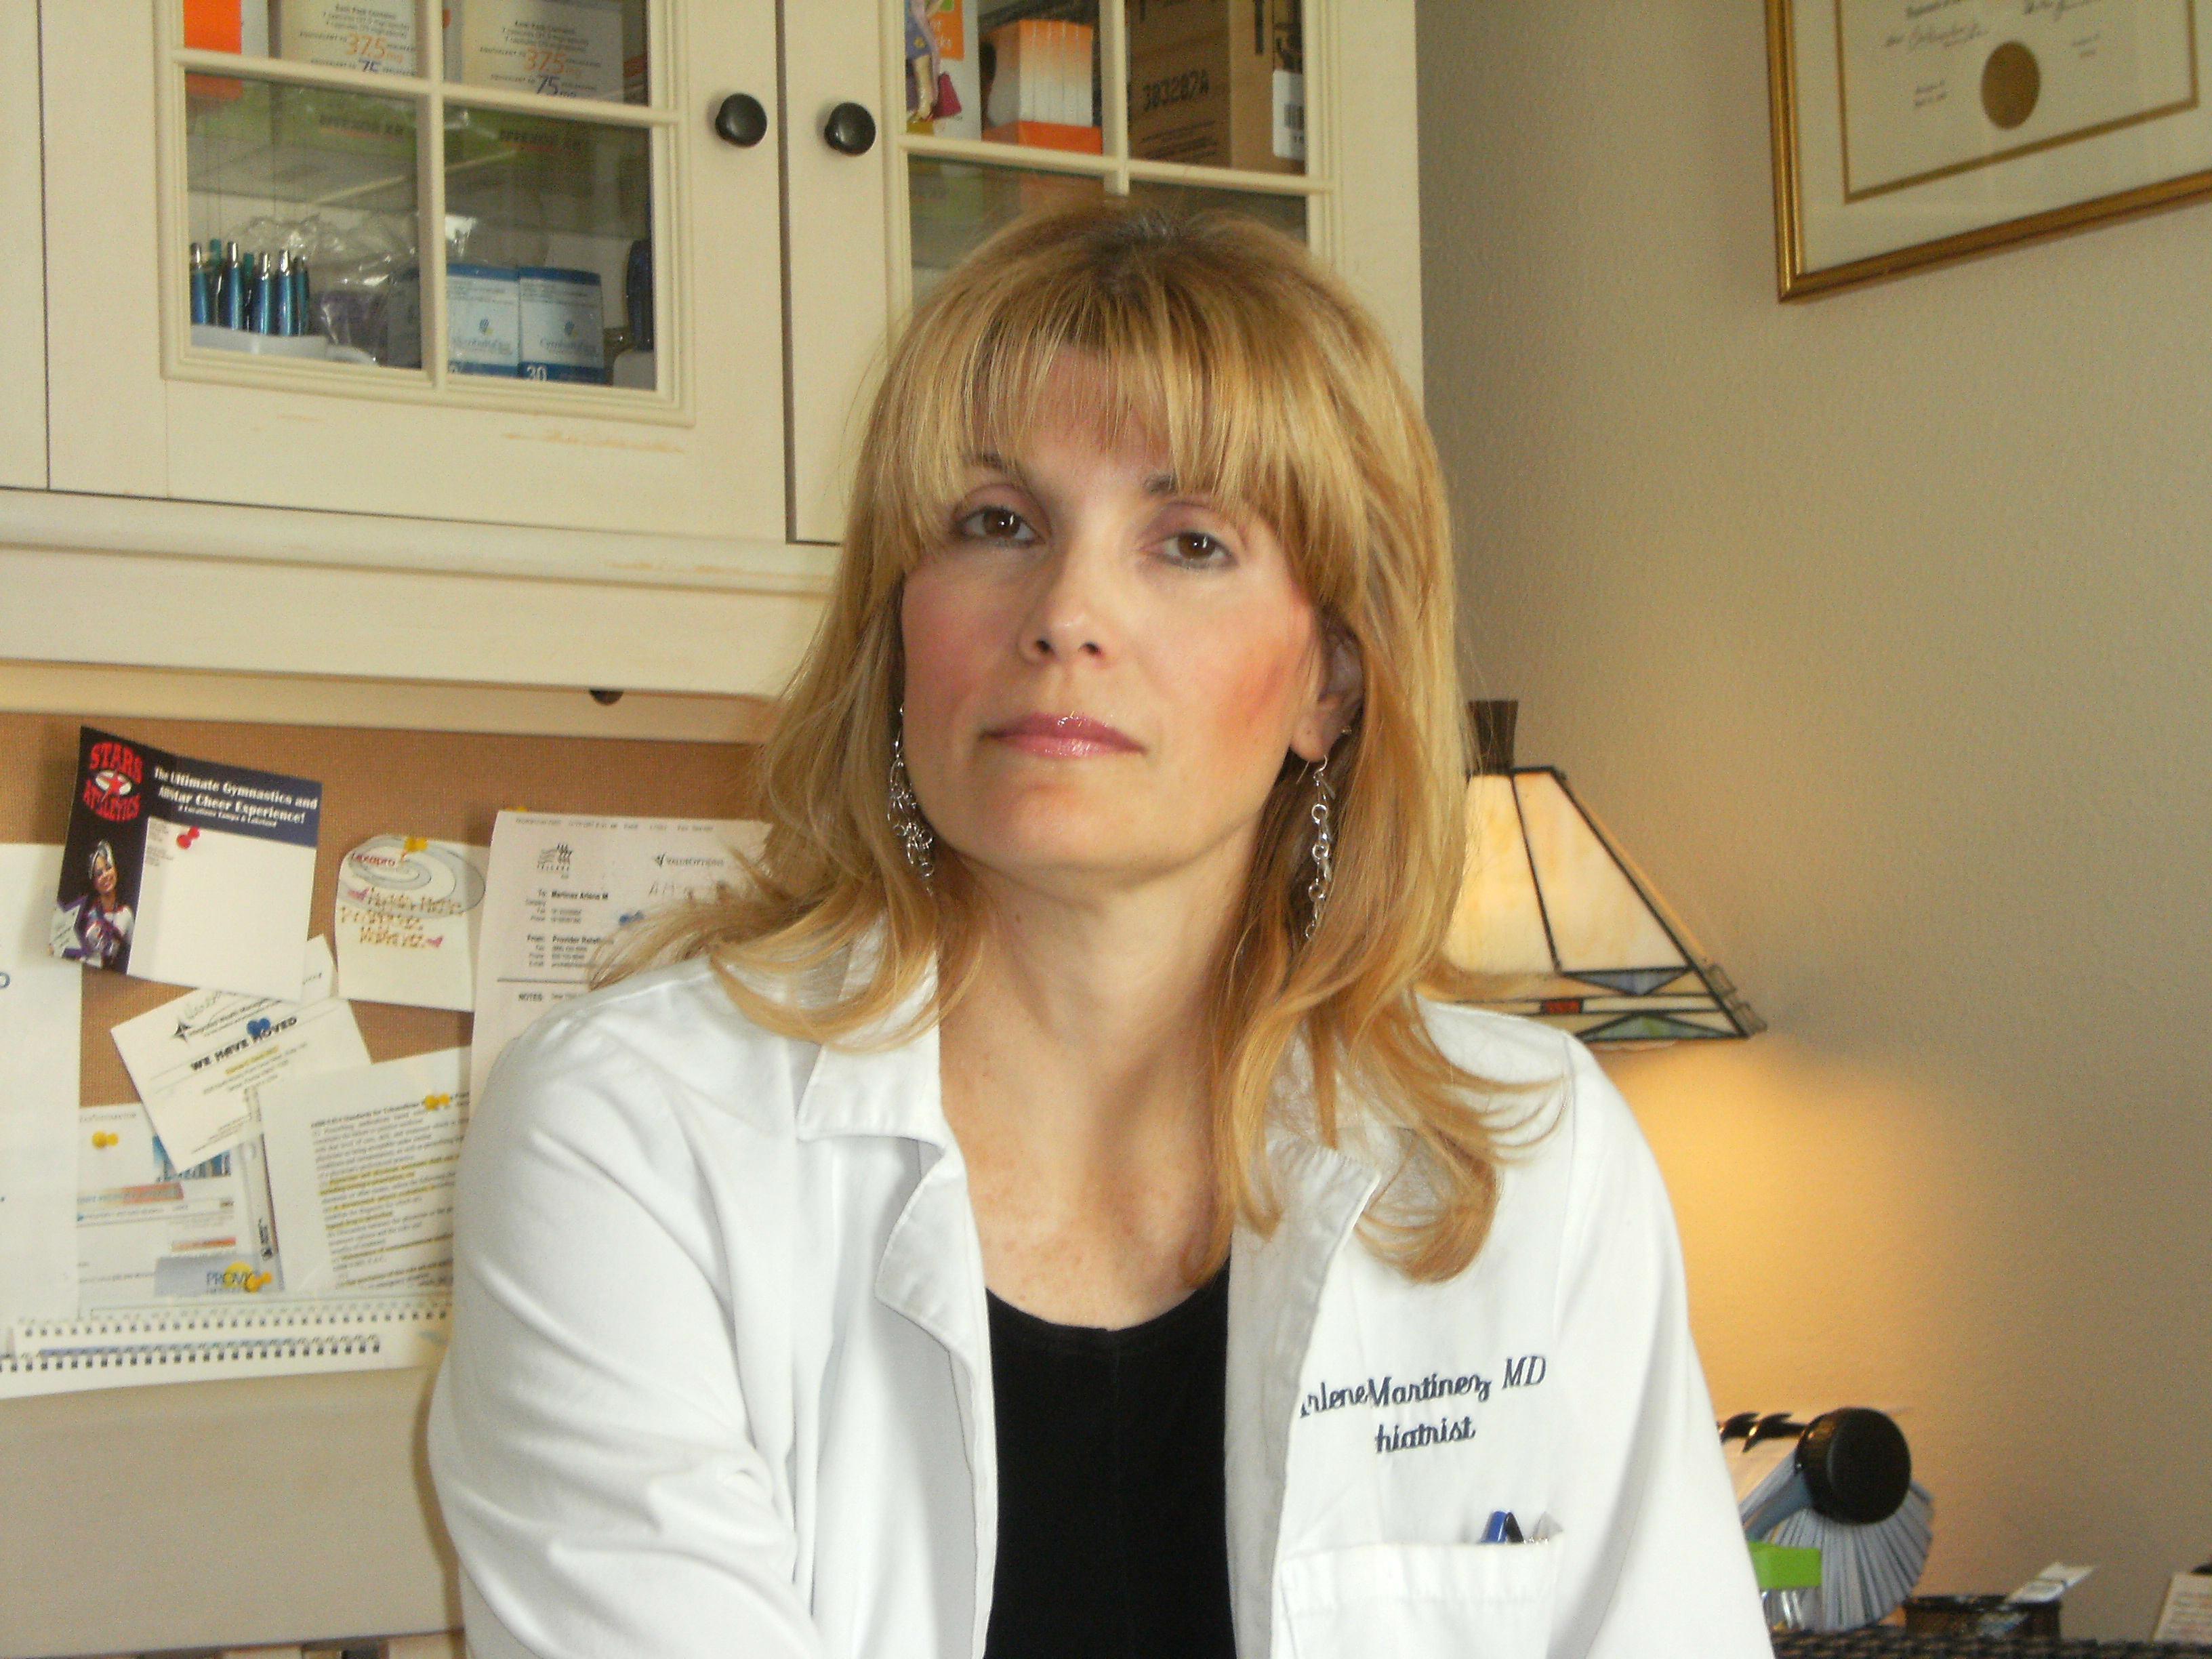 Dr. Arlene M Martinez MD